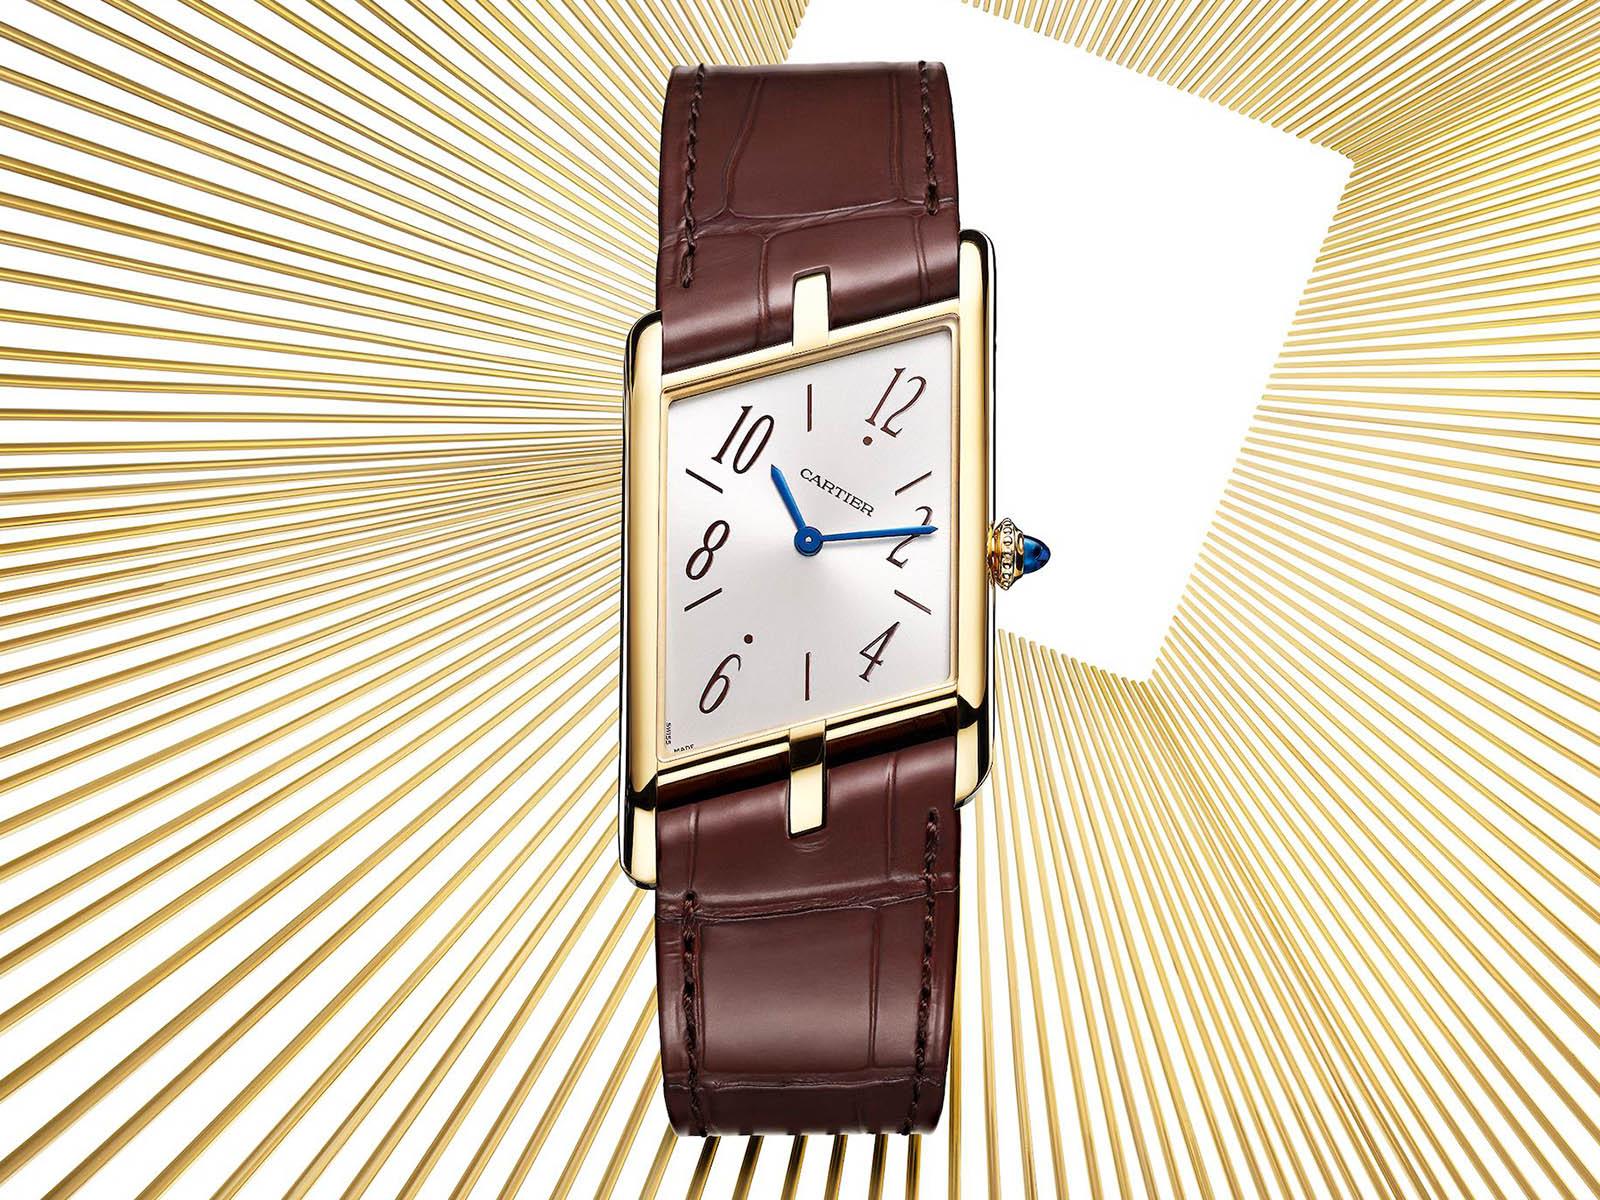 cartier-tank-asymetrique-watches-wonders-2020-4.jpg